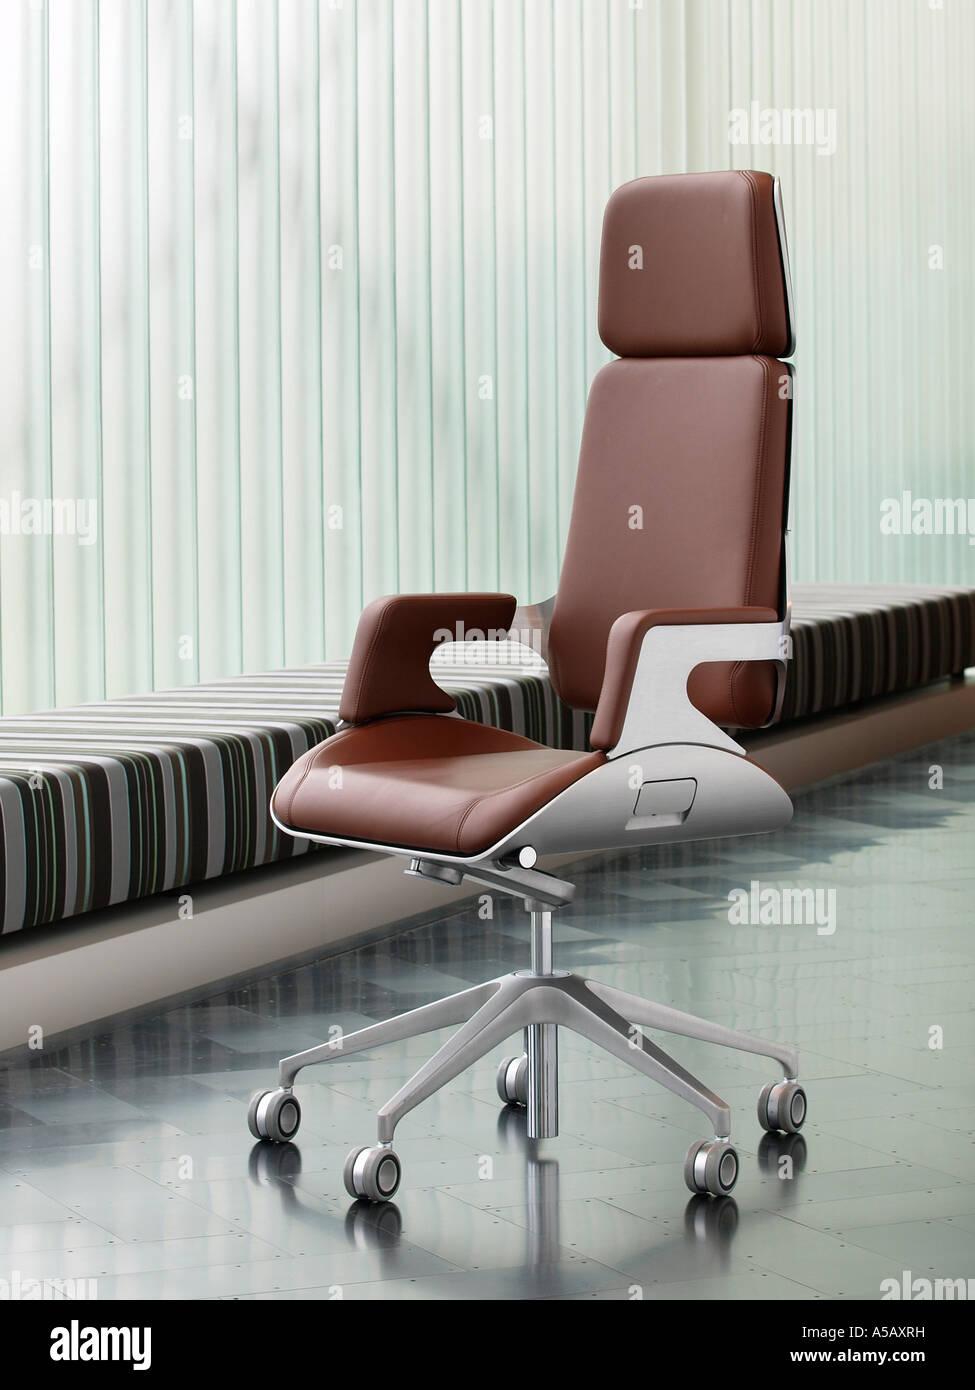 steel chair for office vanity stool brushed metal and brown leather luxury on dark parquet floor design furniture interstuhl silver 362s